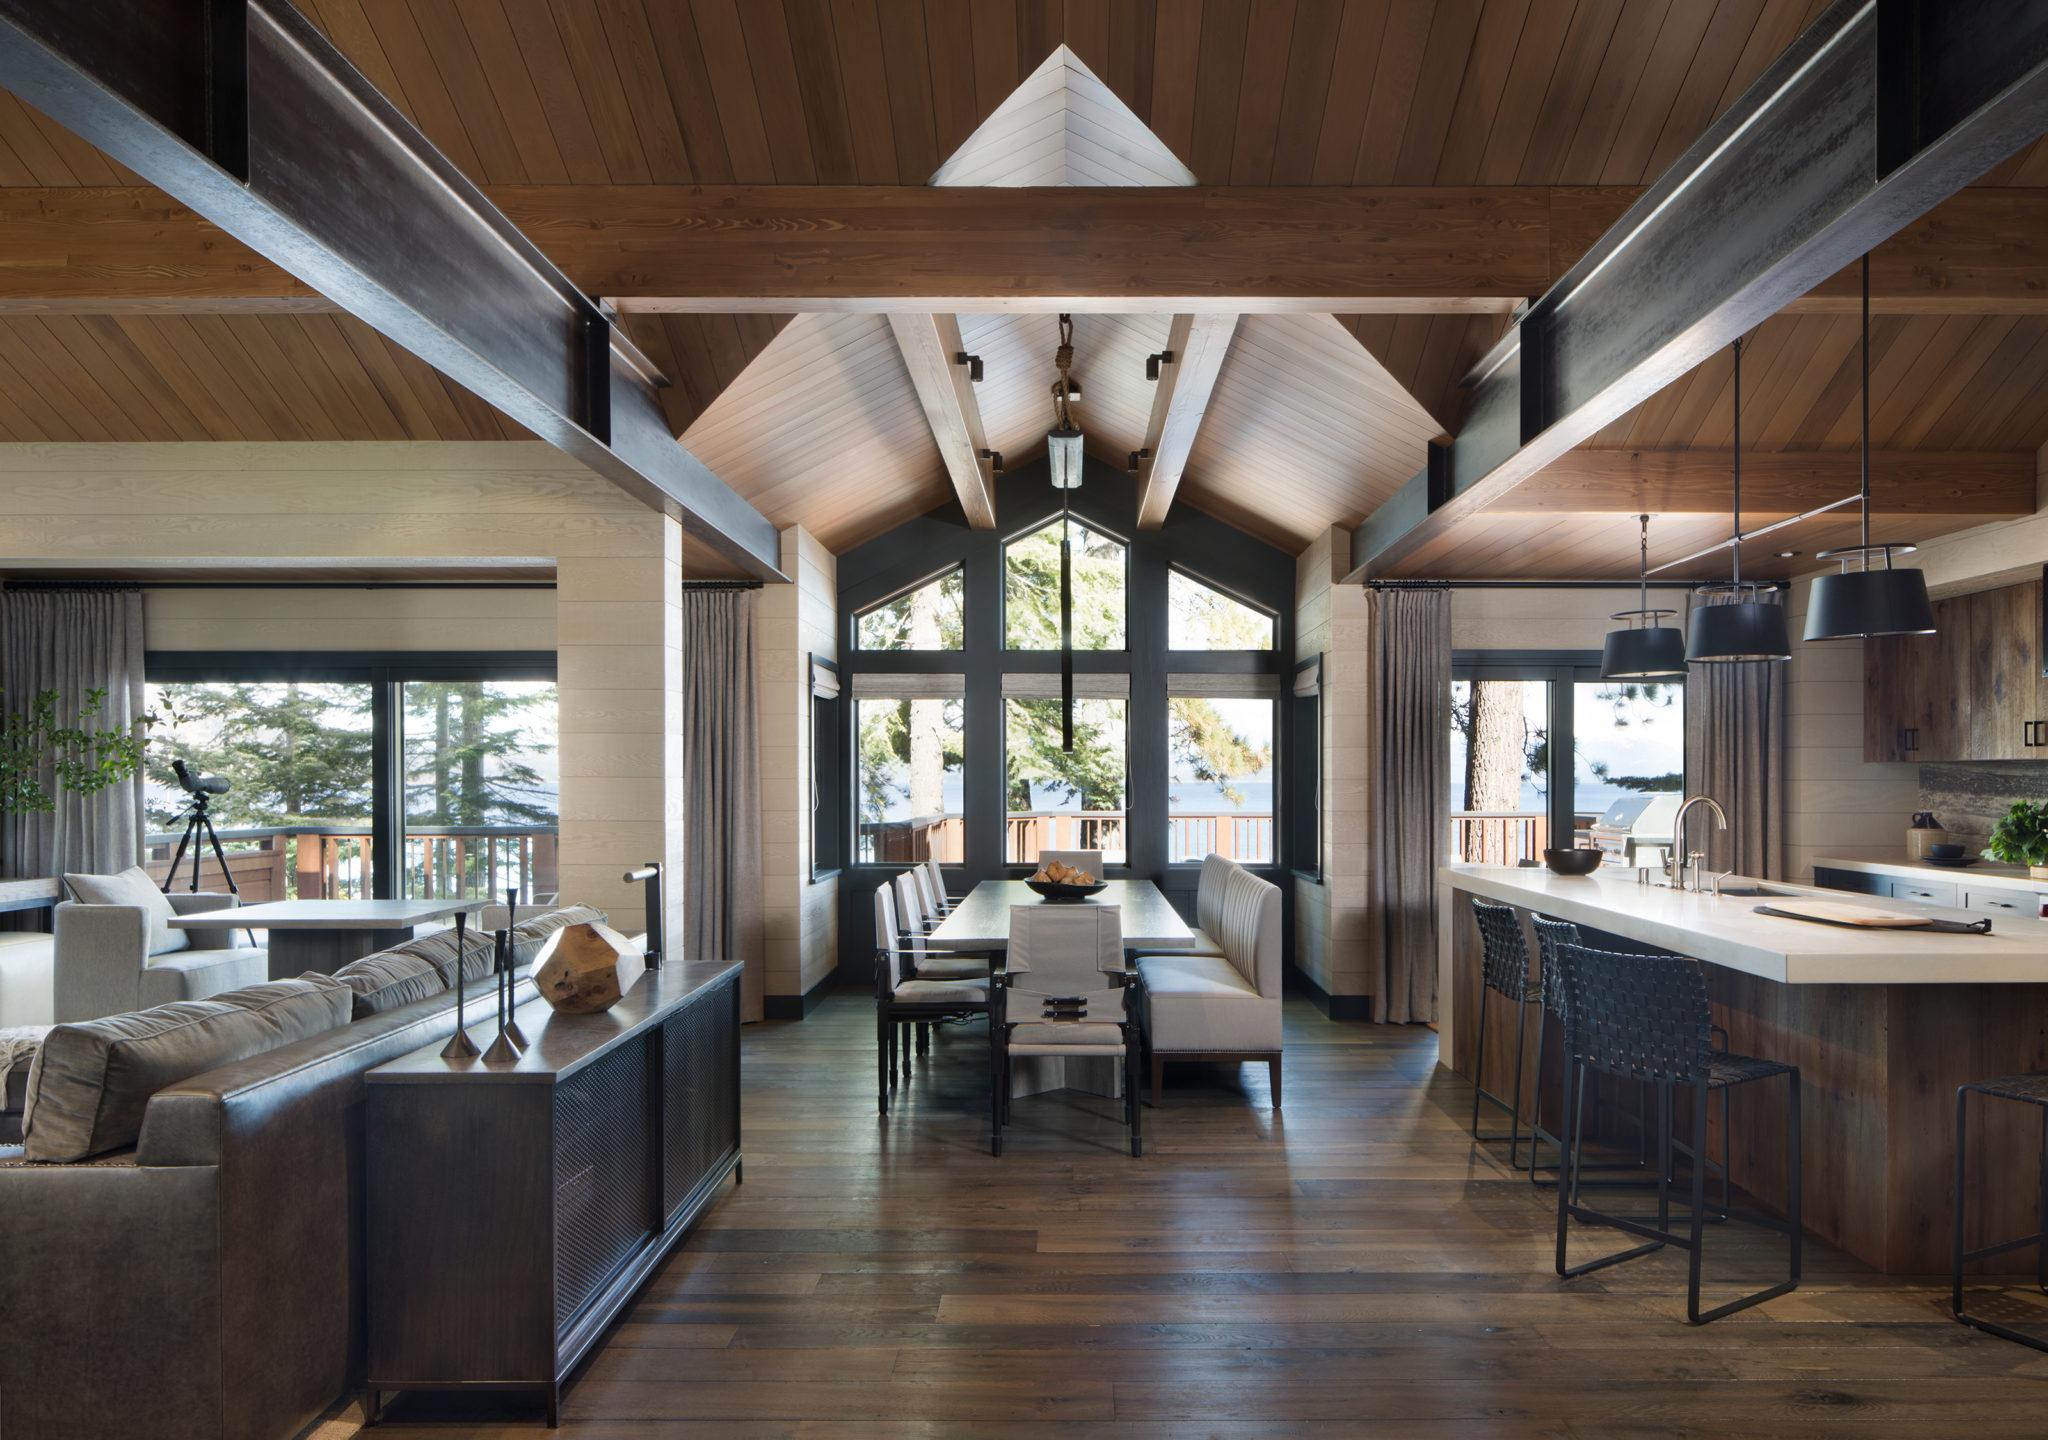 Jennifer_robins_interiors_projects_lake_tahoe_Leupold_02b_off_living_room_LR_dining_room_DR_kitchen